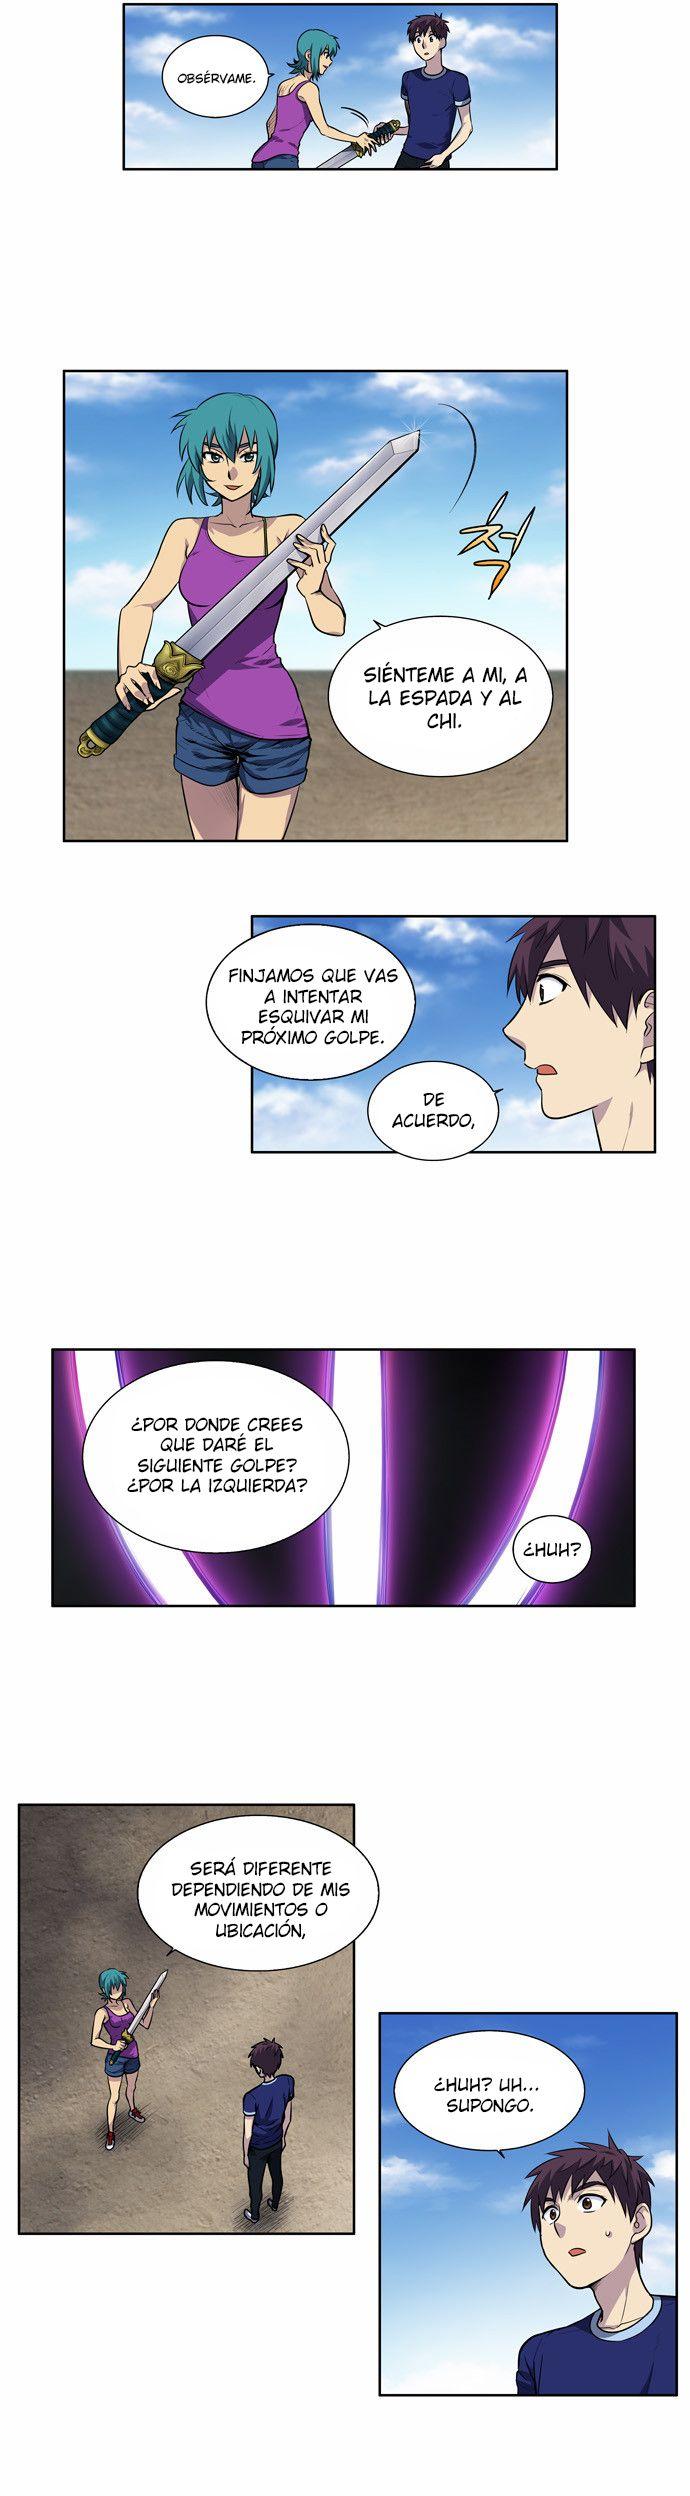 https://c5.ninemanga.com/es_manga/61/1725/464211/b8369b2e0914ae0229b38b9eb8fdfa7d.jpg Page 9